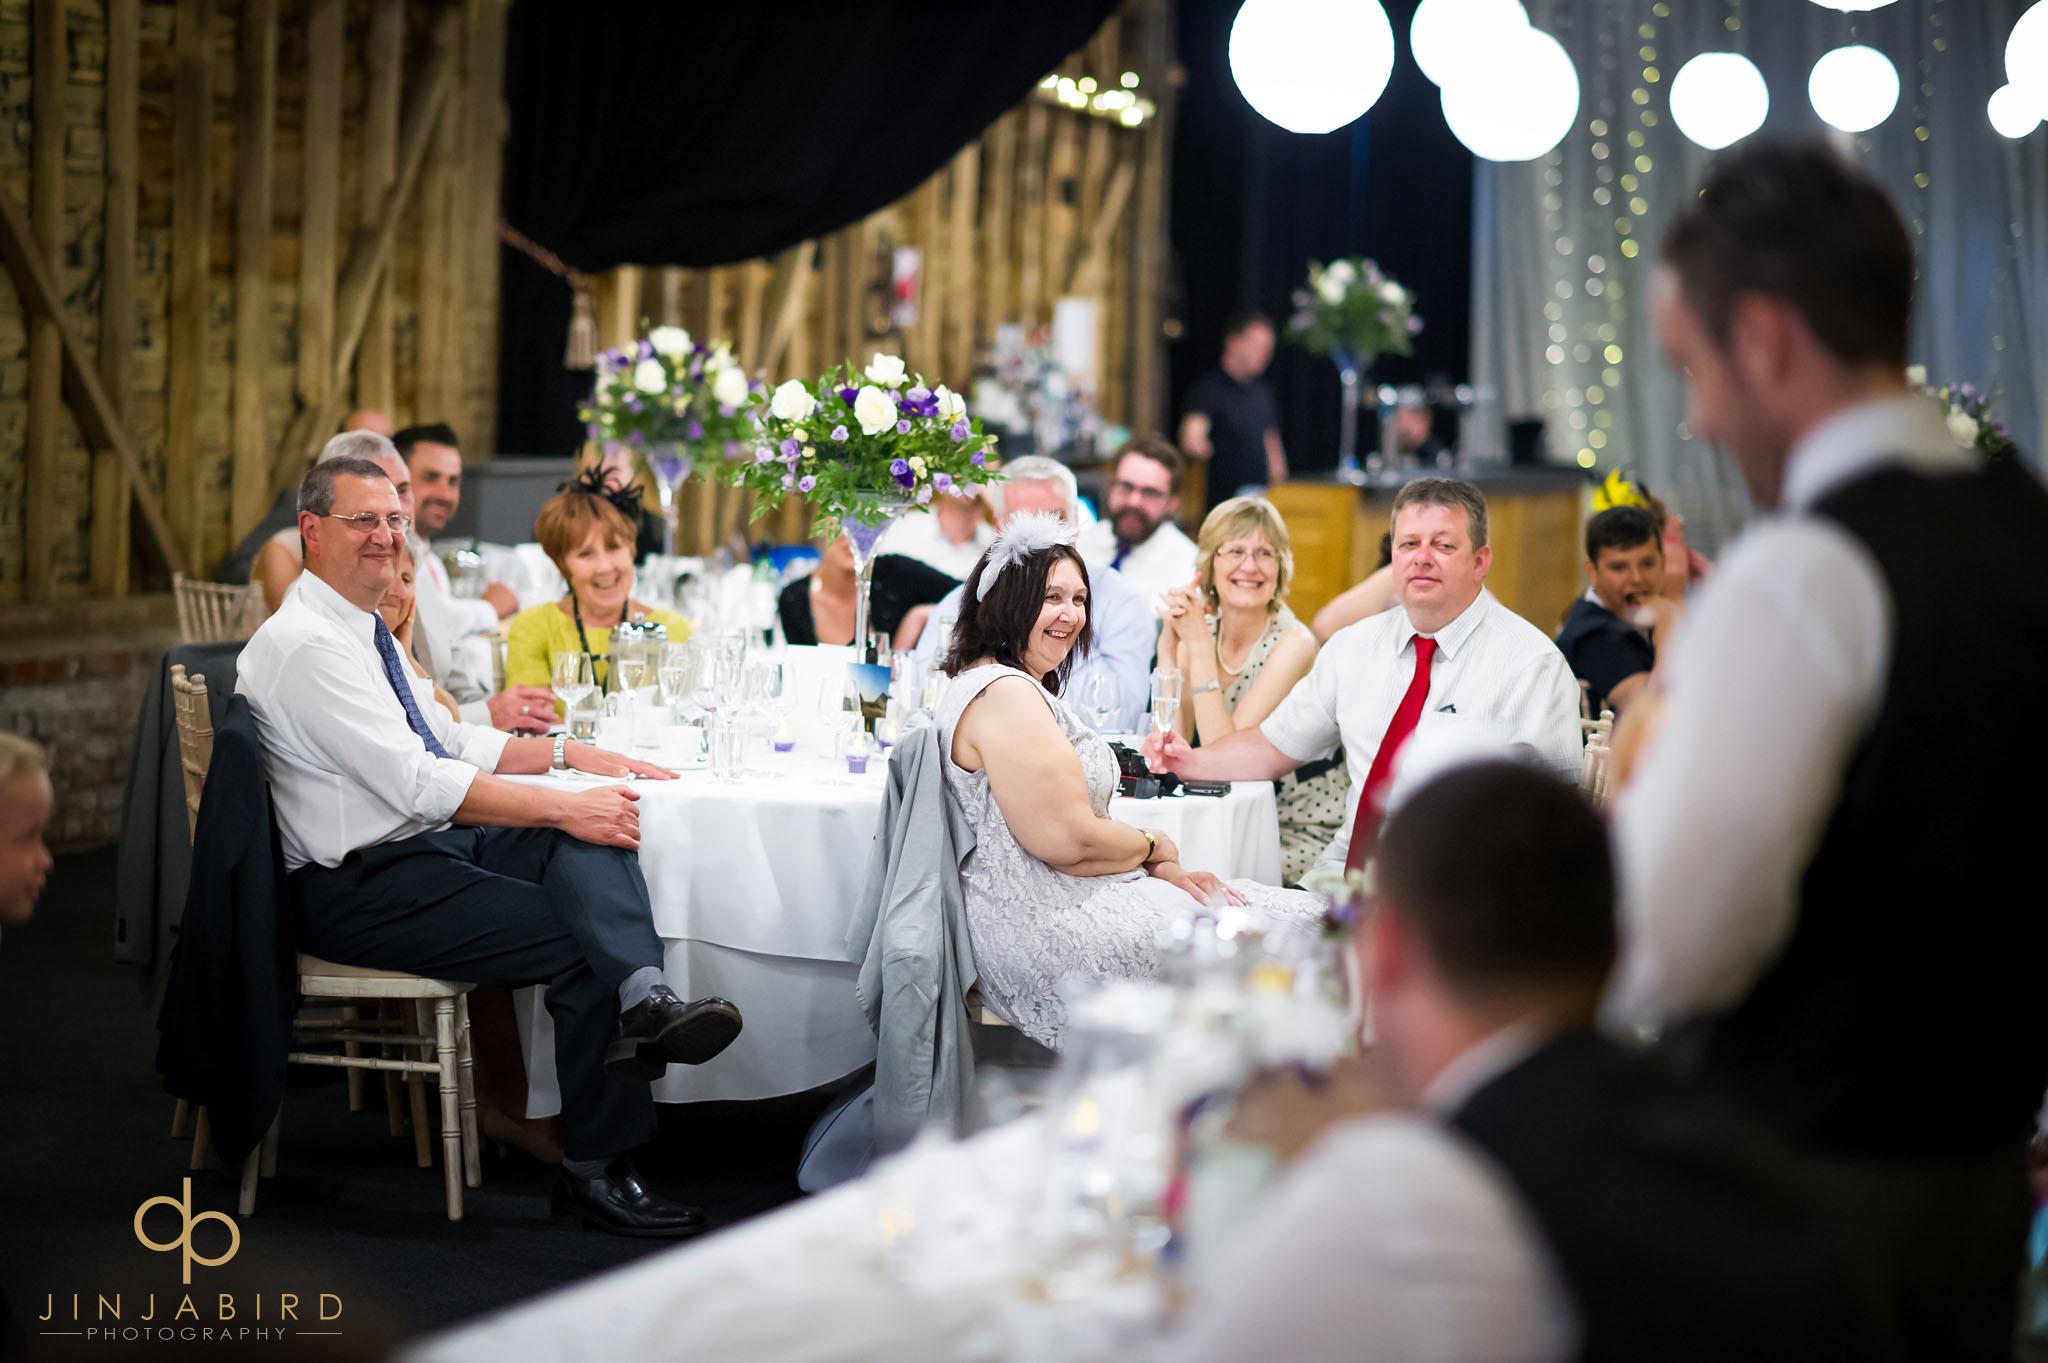 childerley hall wedding photographs